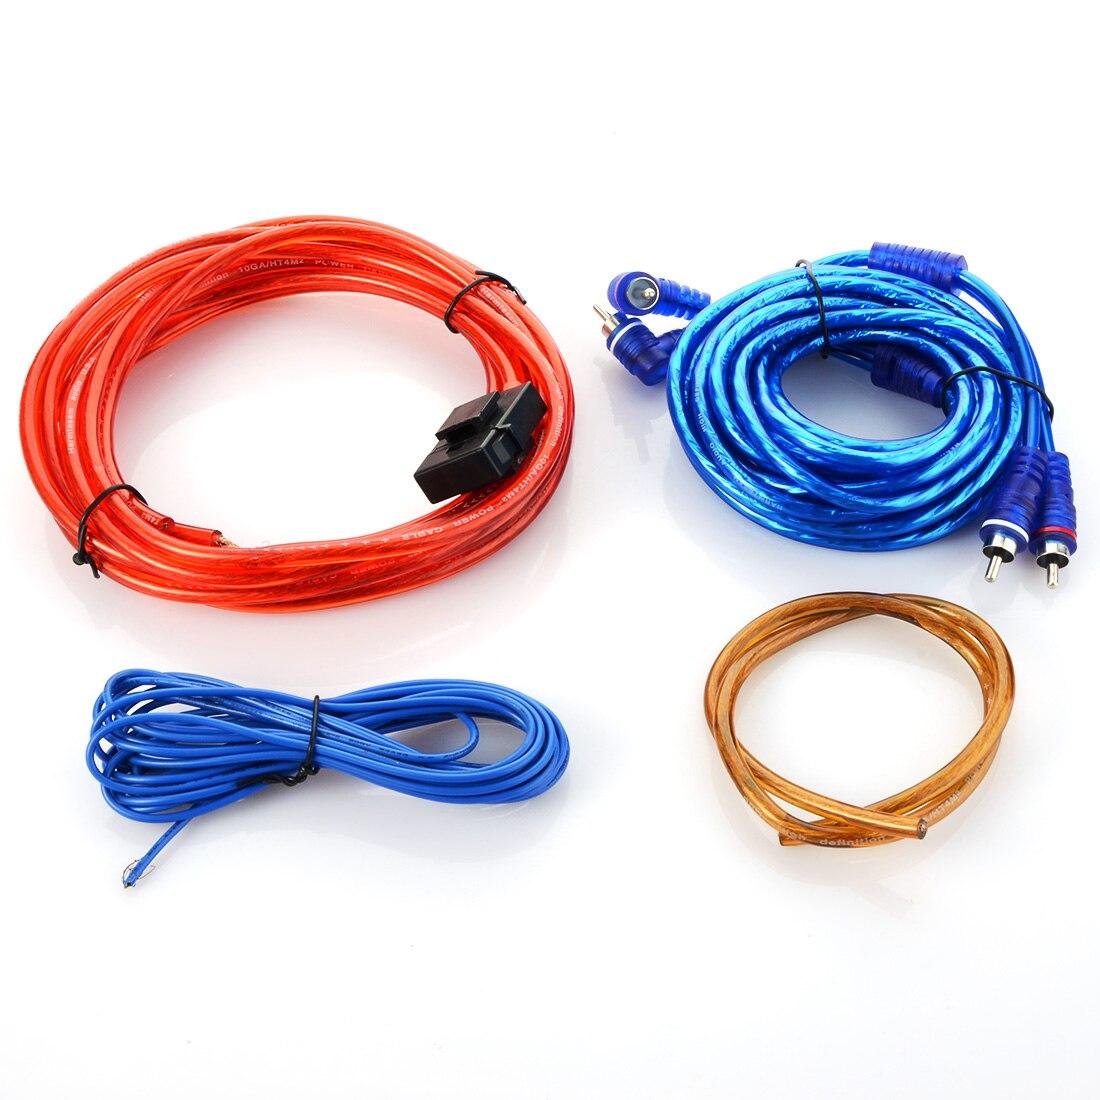 4 5m 8GA Car Audio Wire RCA font b Amplifier b font font b Subwoofer b